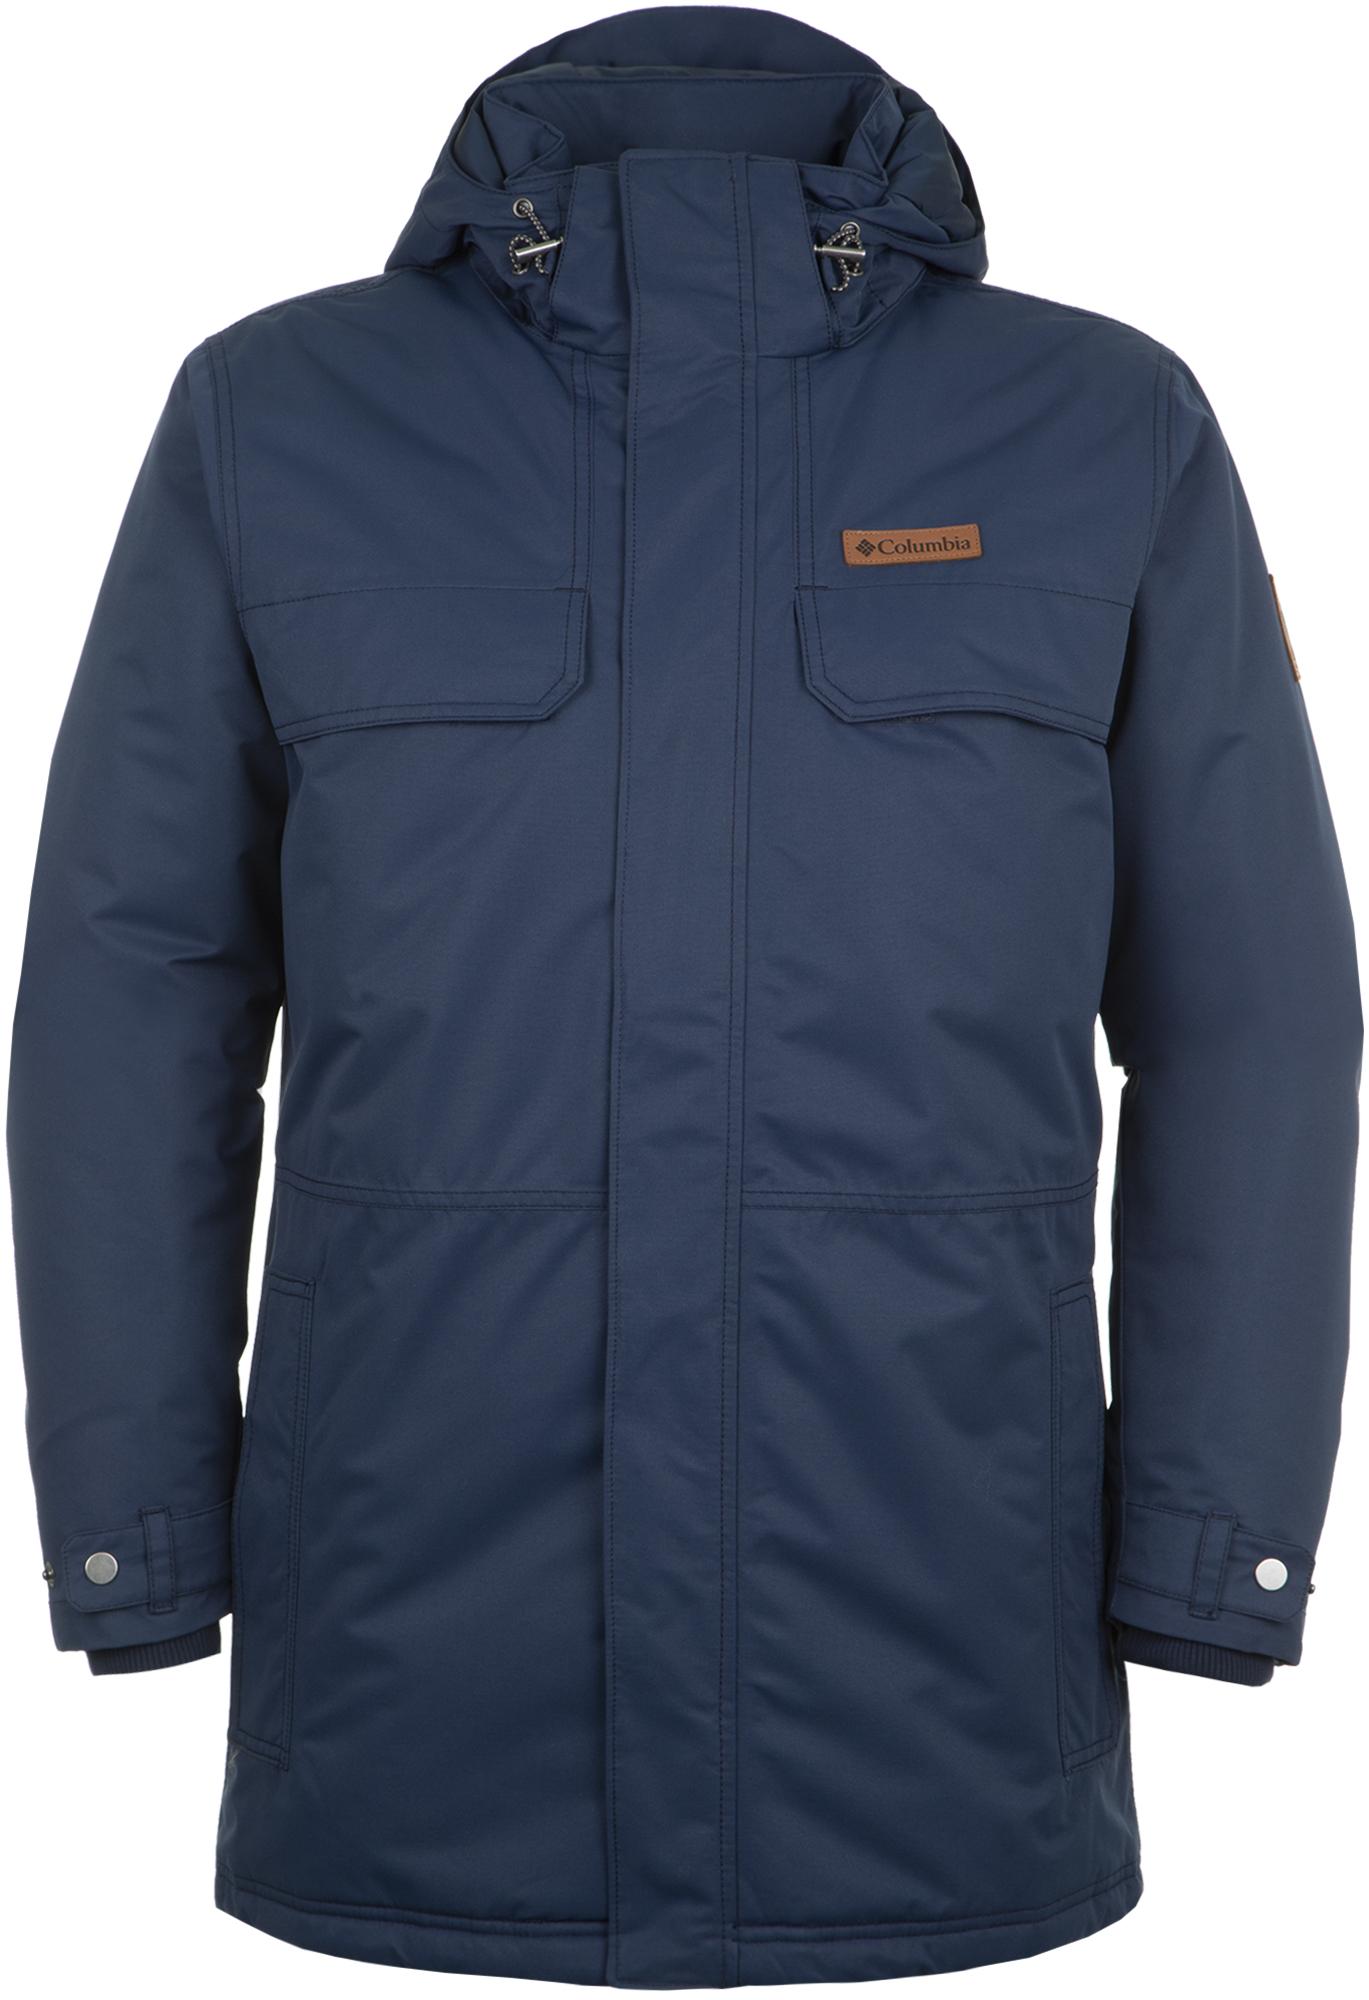 Columbia Куртка утепленная мужская Columbia Rugged Path, размер 56-58 цена и фото